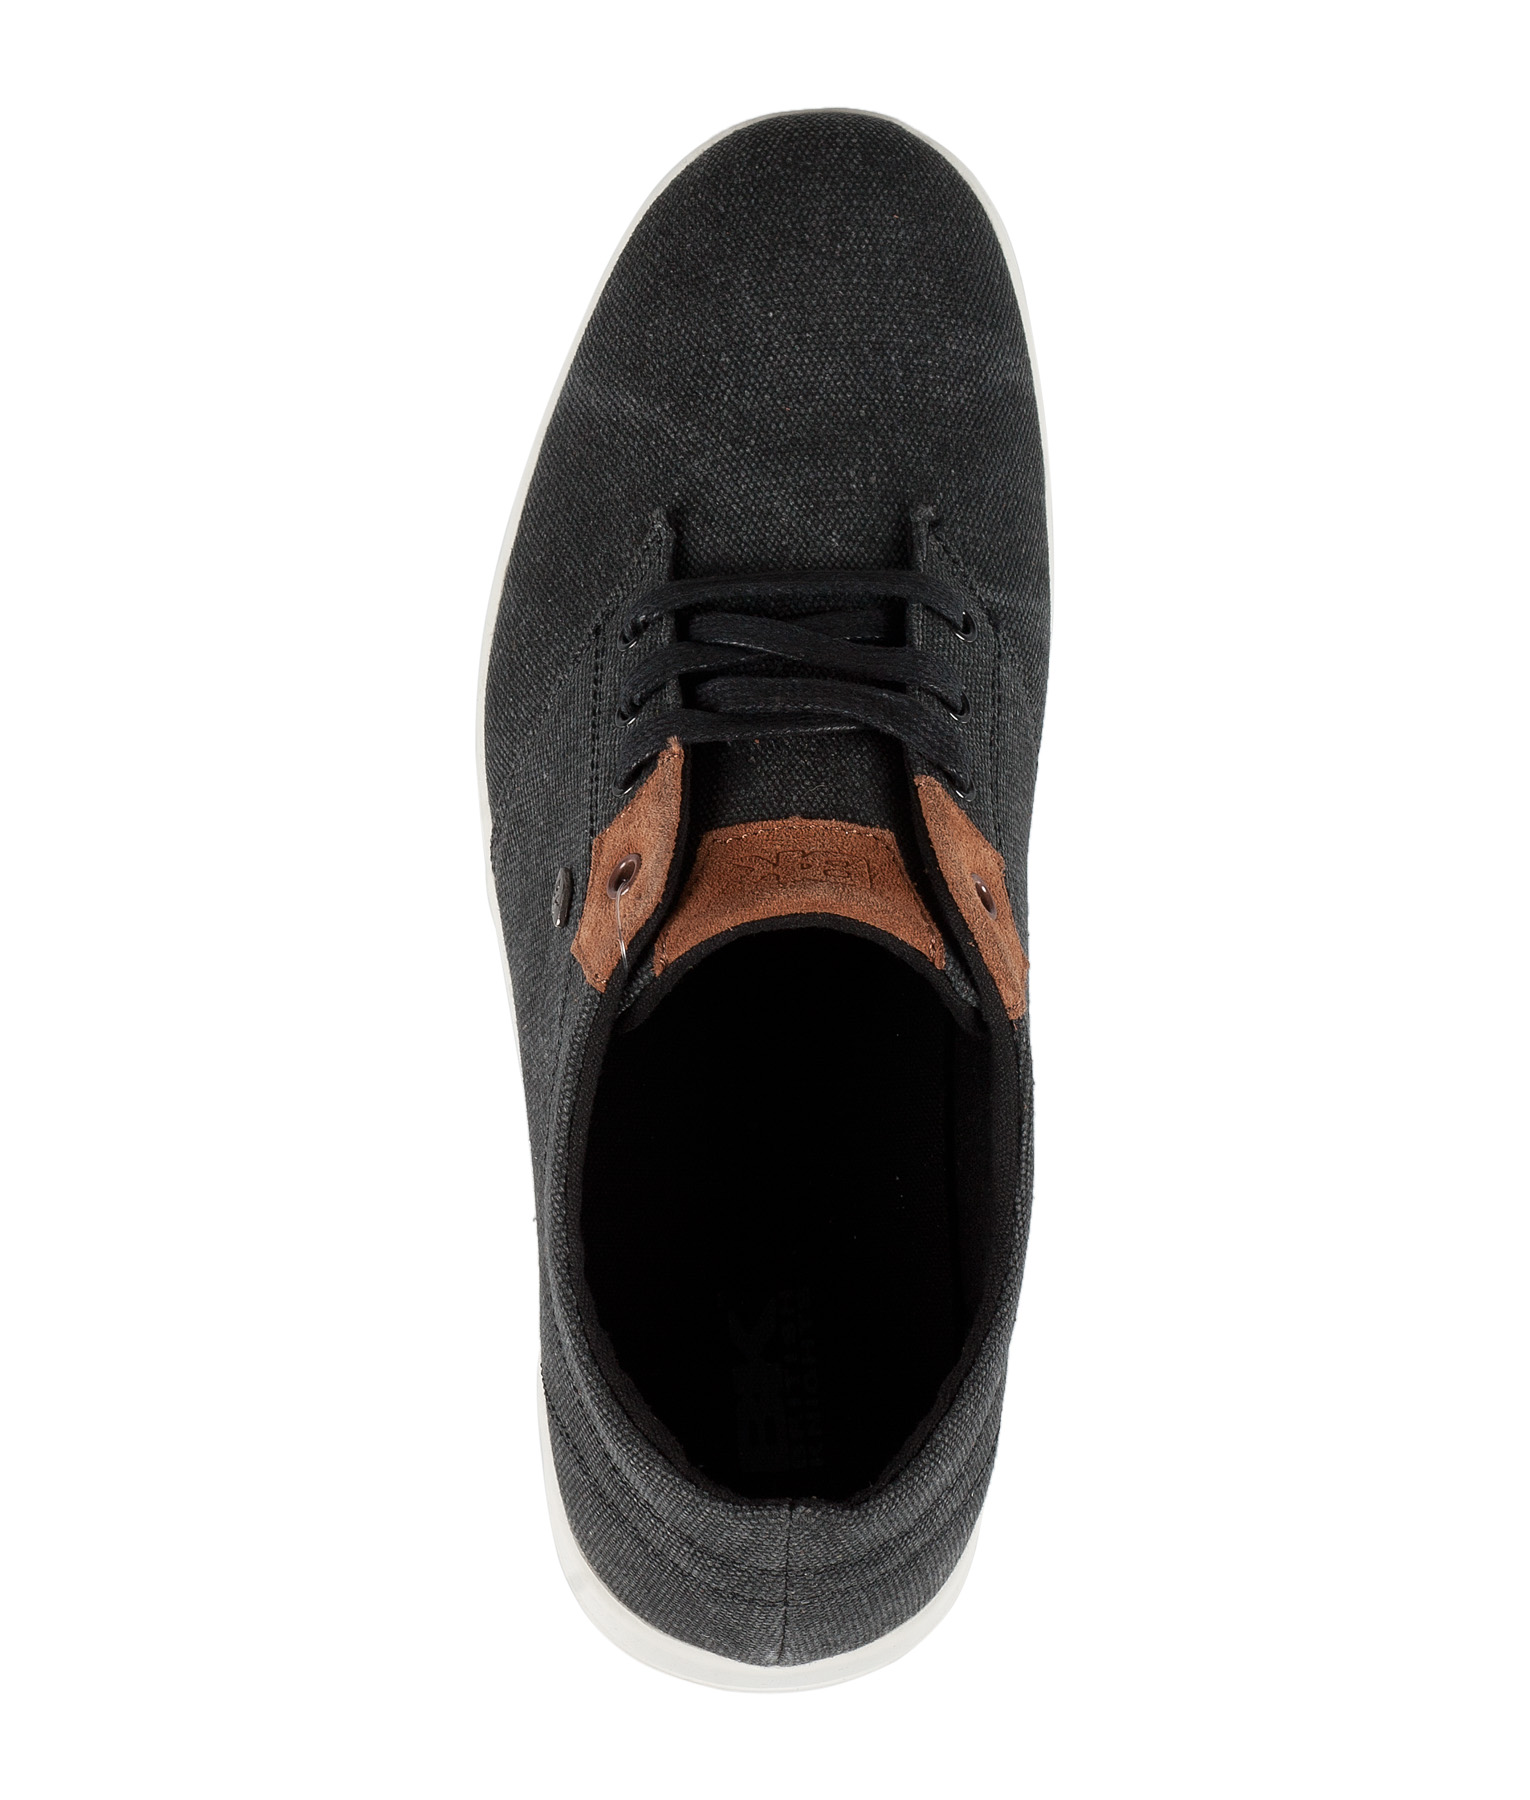 british knights herren sneaker by bk jeans 2012 star mod. Black Bedroom Furniture Sets. Home Design Ideas